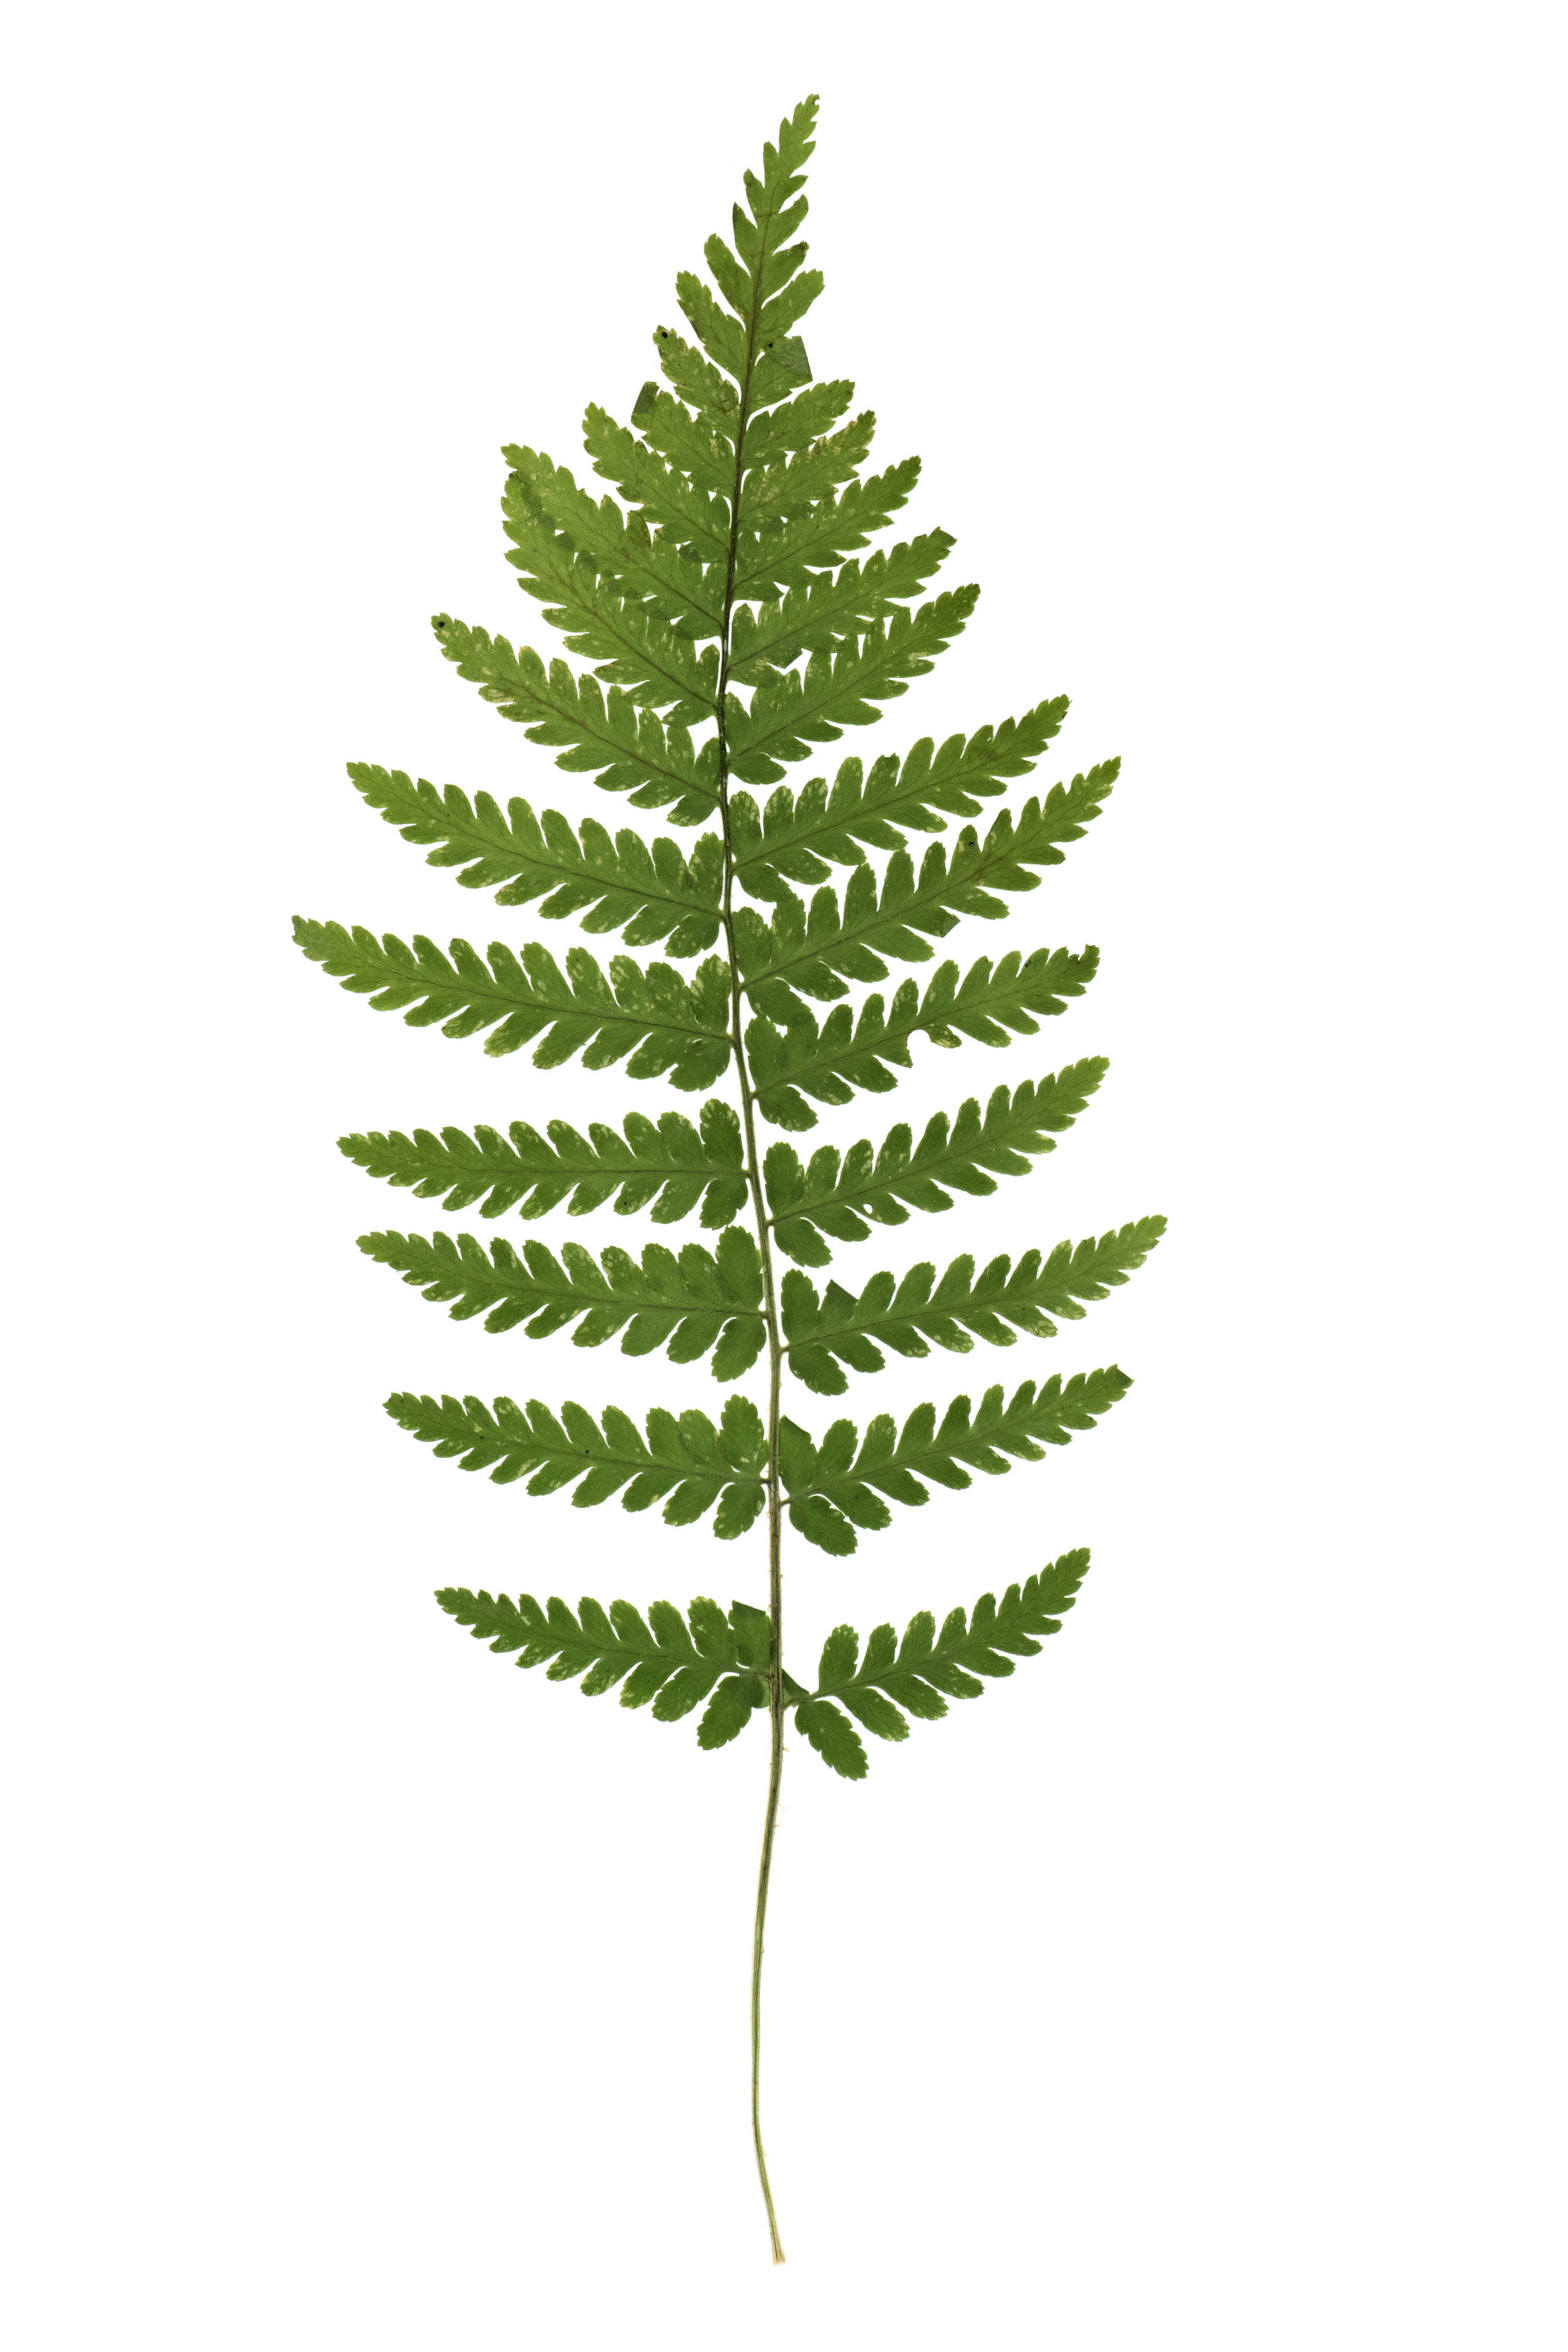 New! Spinulose Wood Fern / Dryopteris carthusiana